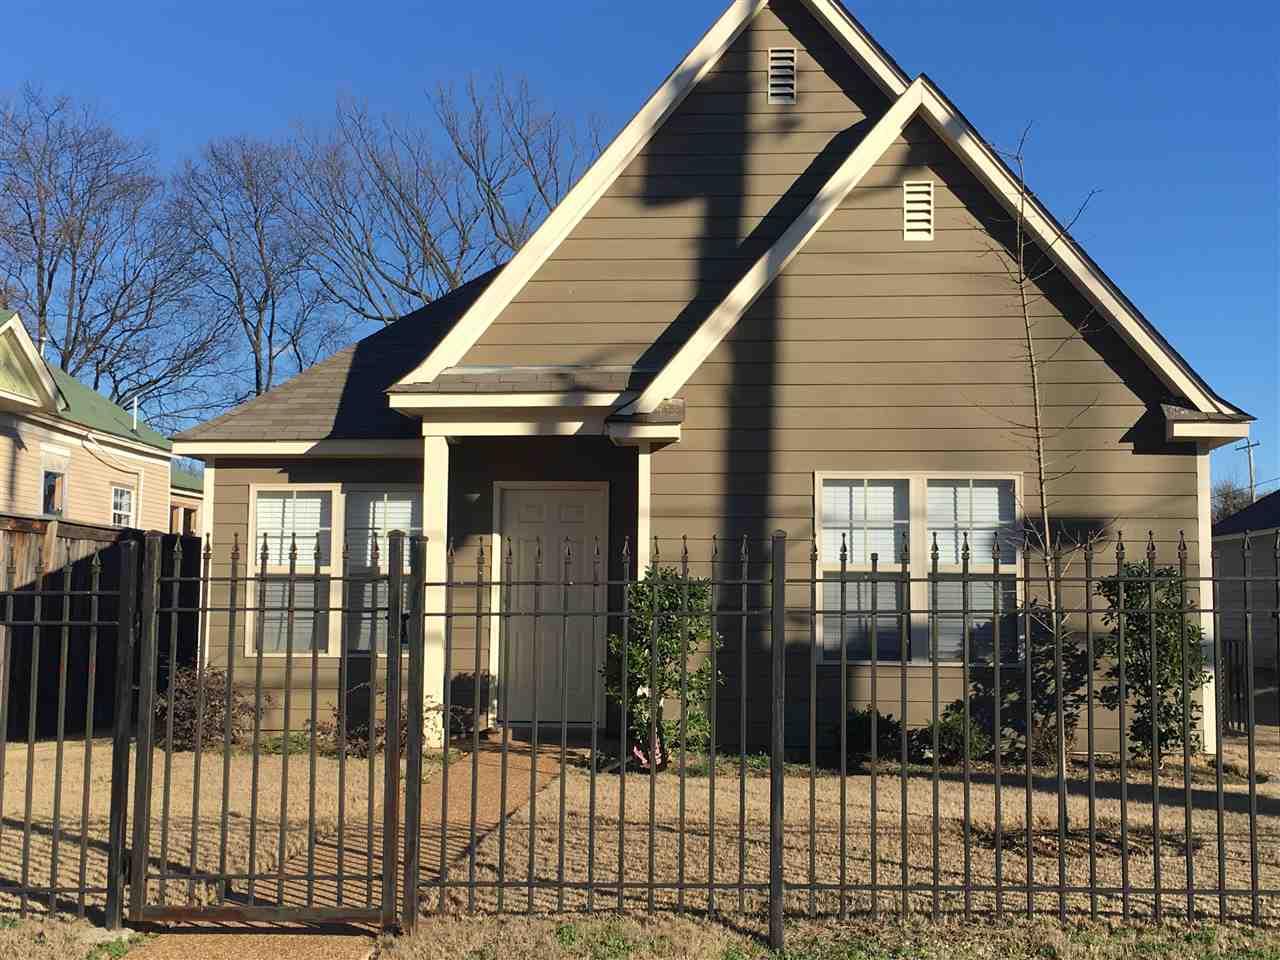 310 N CLAYBROOK ST, Memphis, TN 38104